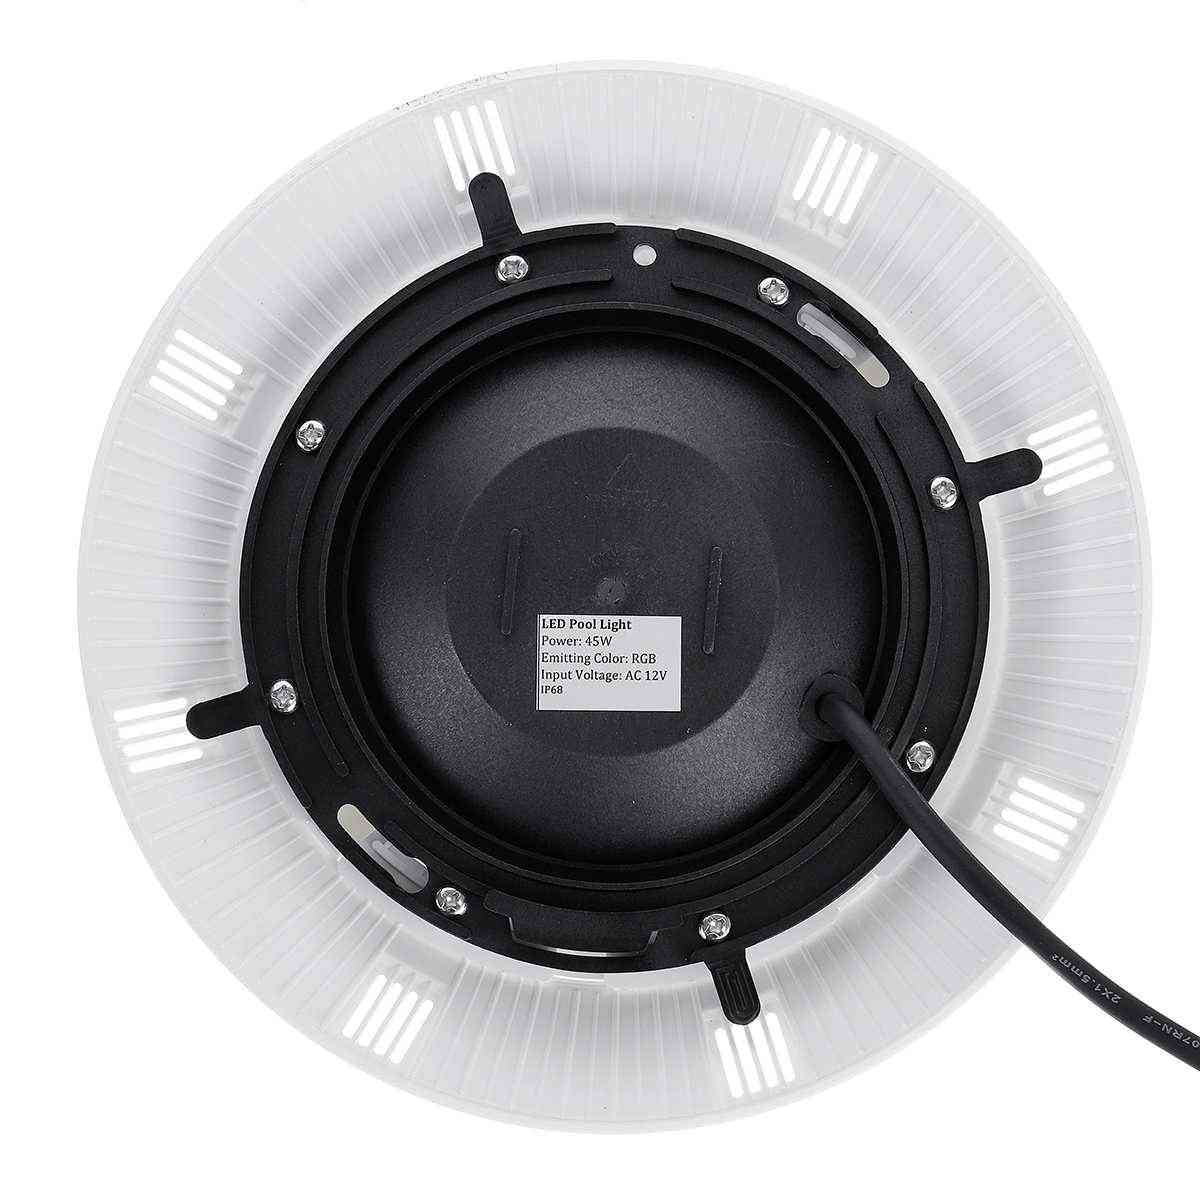 Rgb Led Swimming Pool Light -ip68 Waterproof With Ac12v-24v